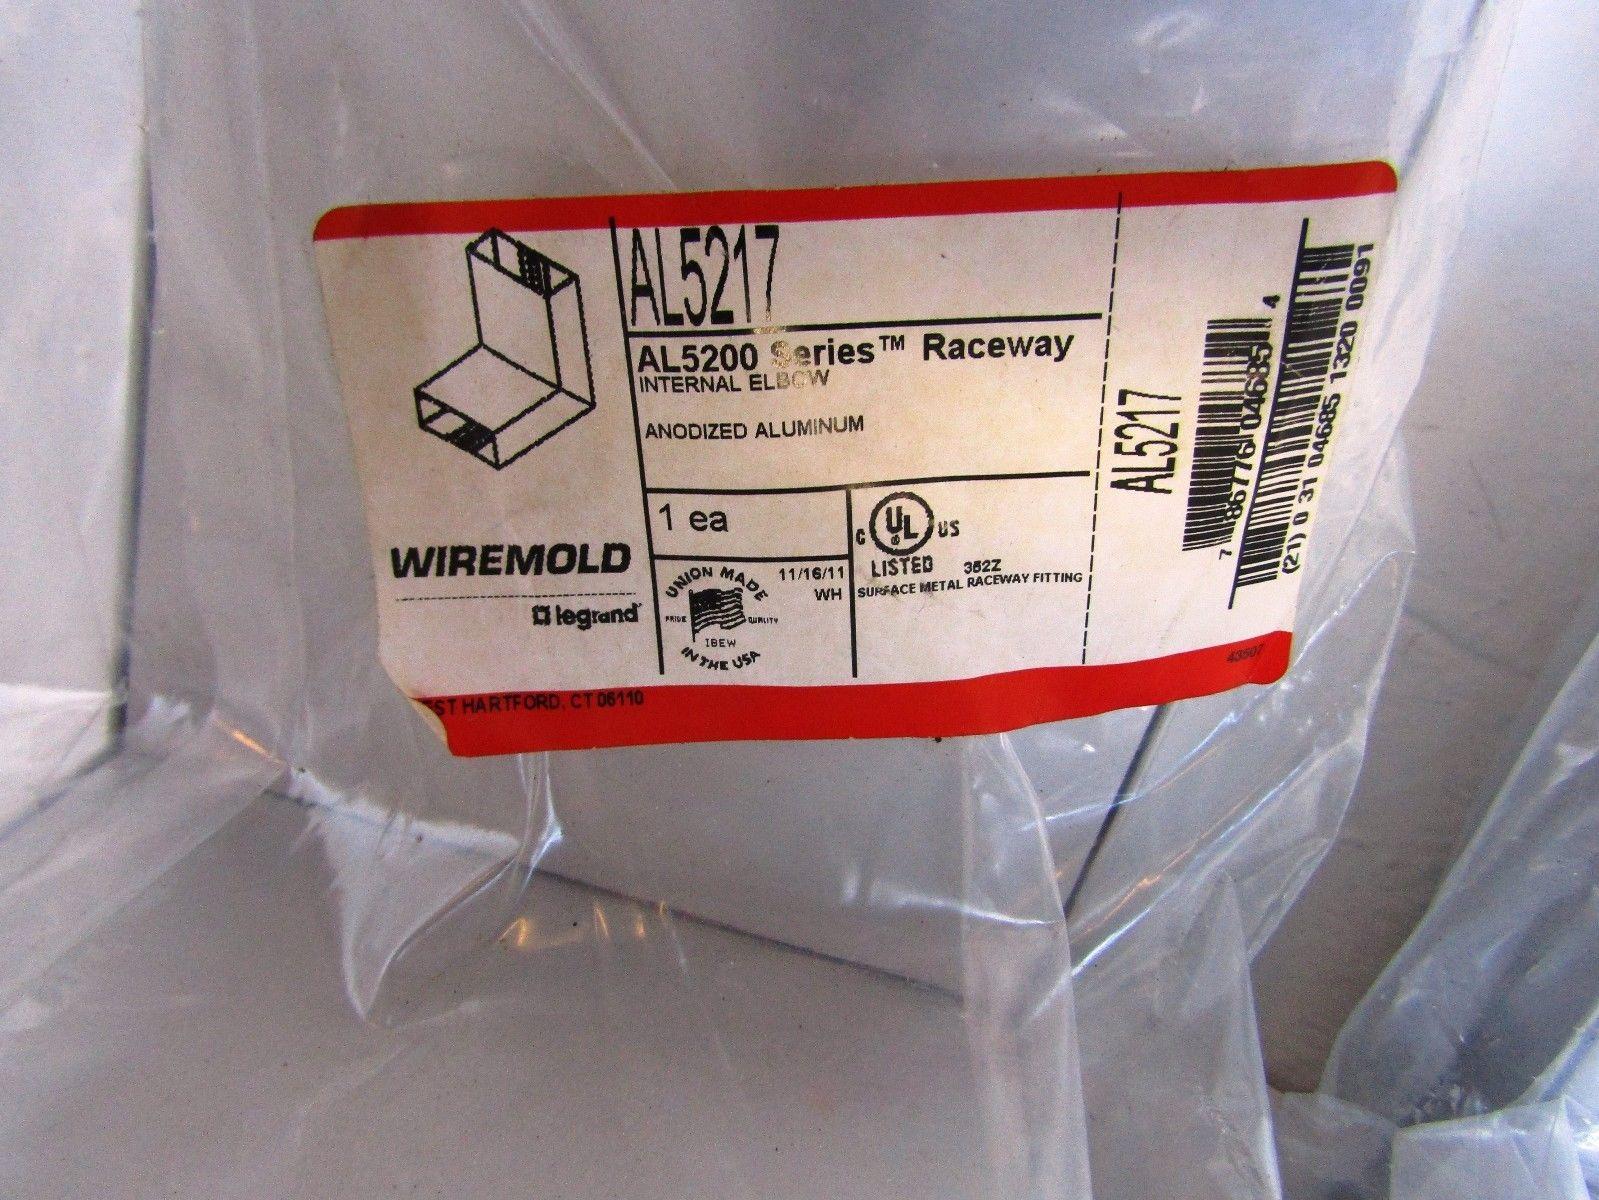 Wonderful Aluminum Wiremold Photos - Electrical Wiring Diagram ...